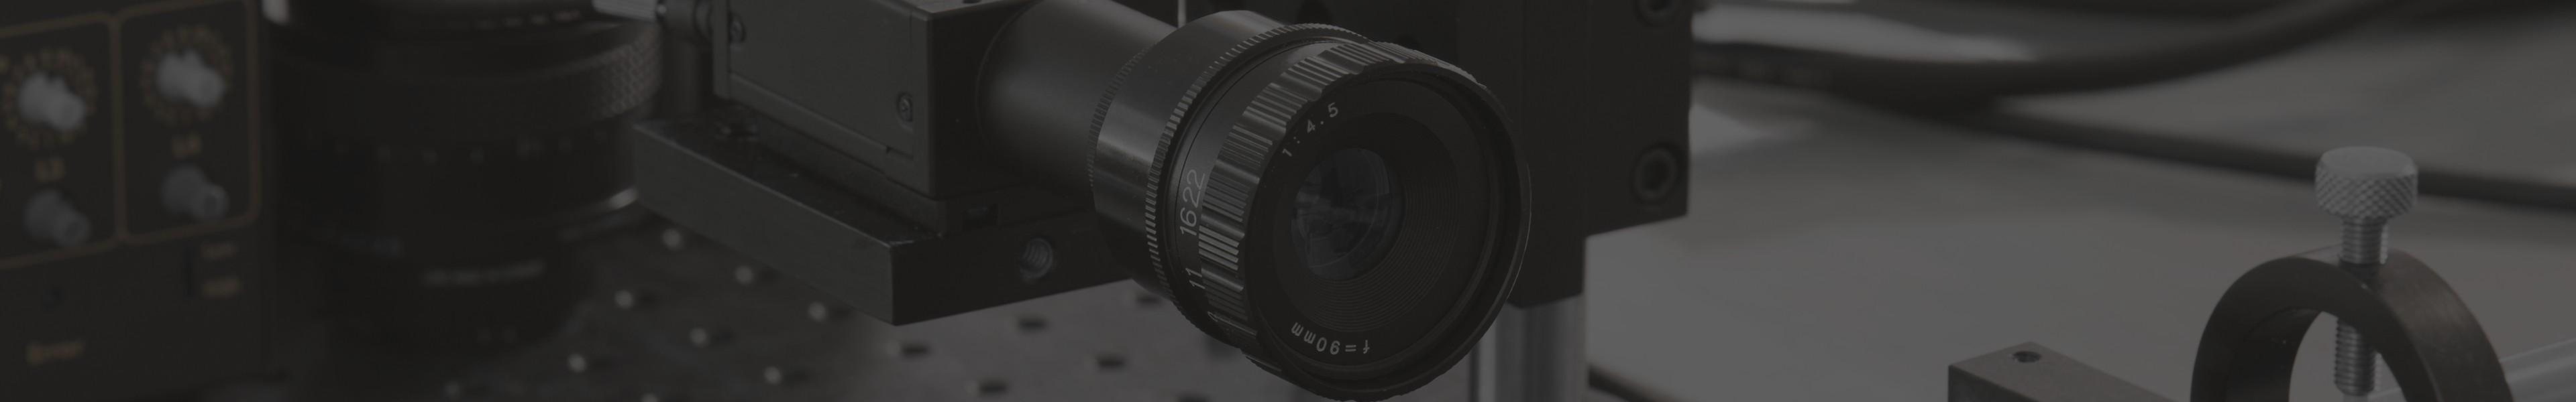 Lexcom Consultants Ltd Machine Vision AOI